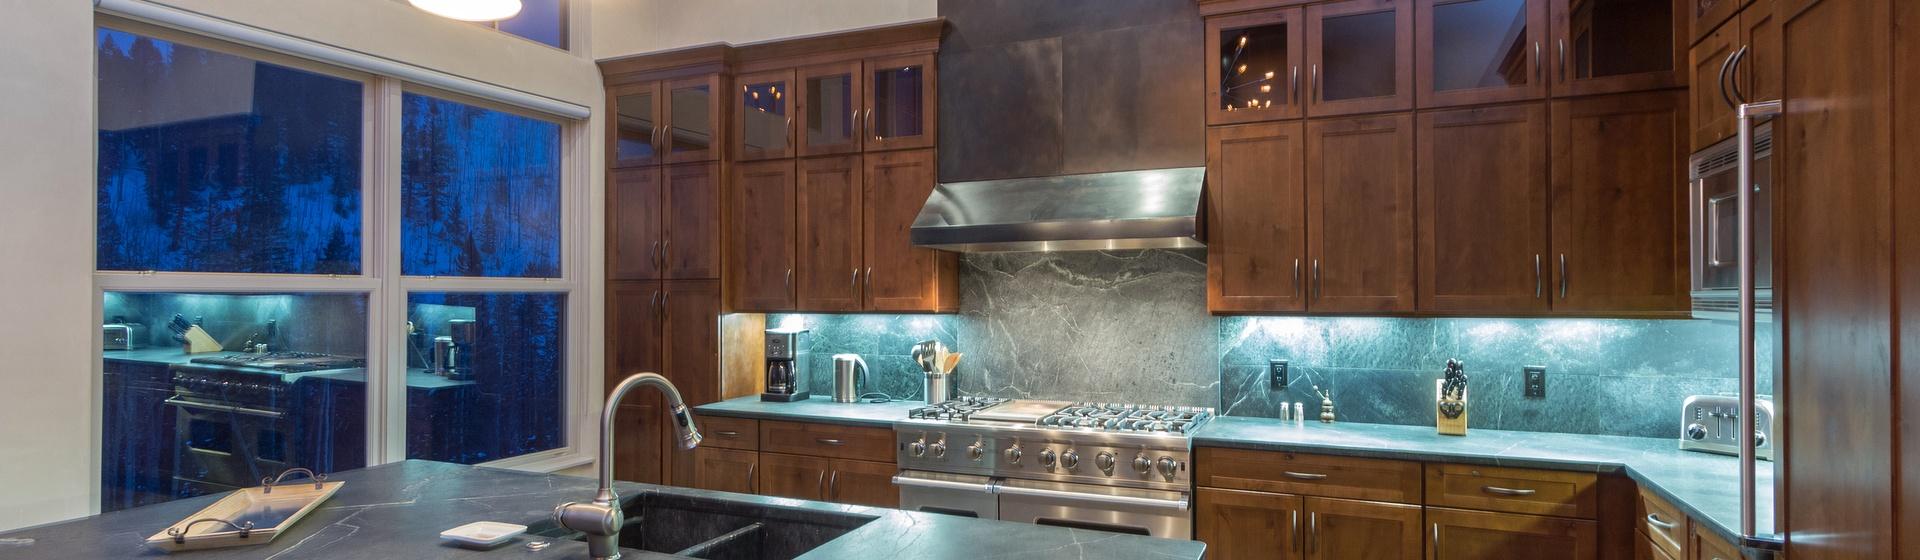 7-Telluride-Cassidy-Ridge-A103-Kitchen-Web.jpg